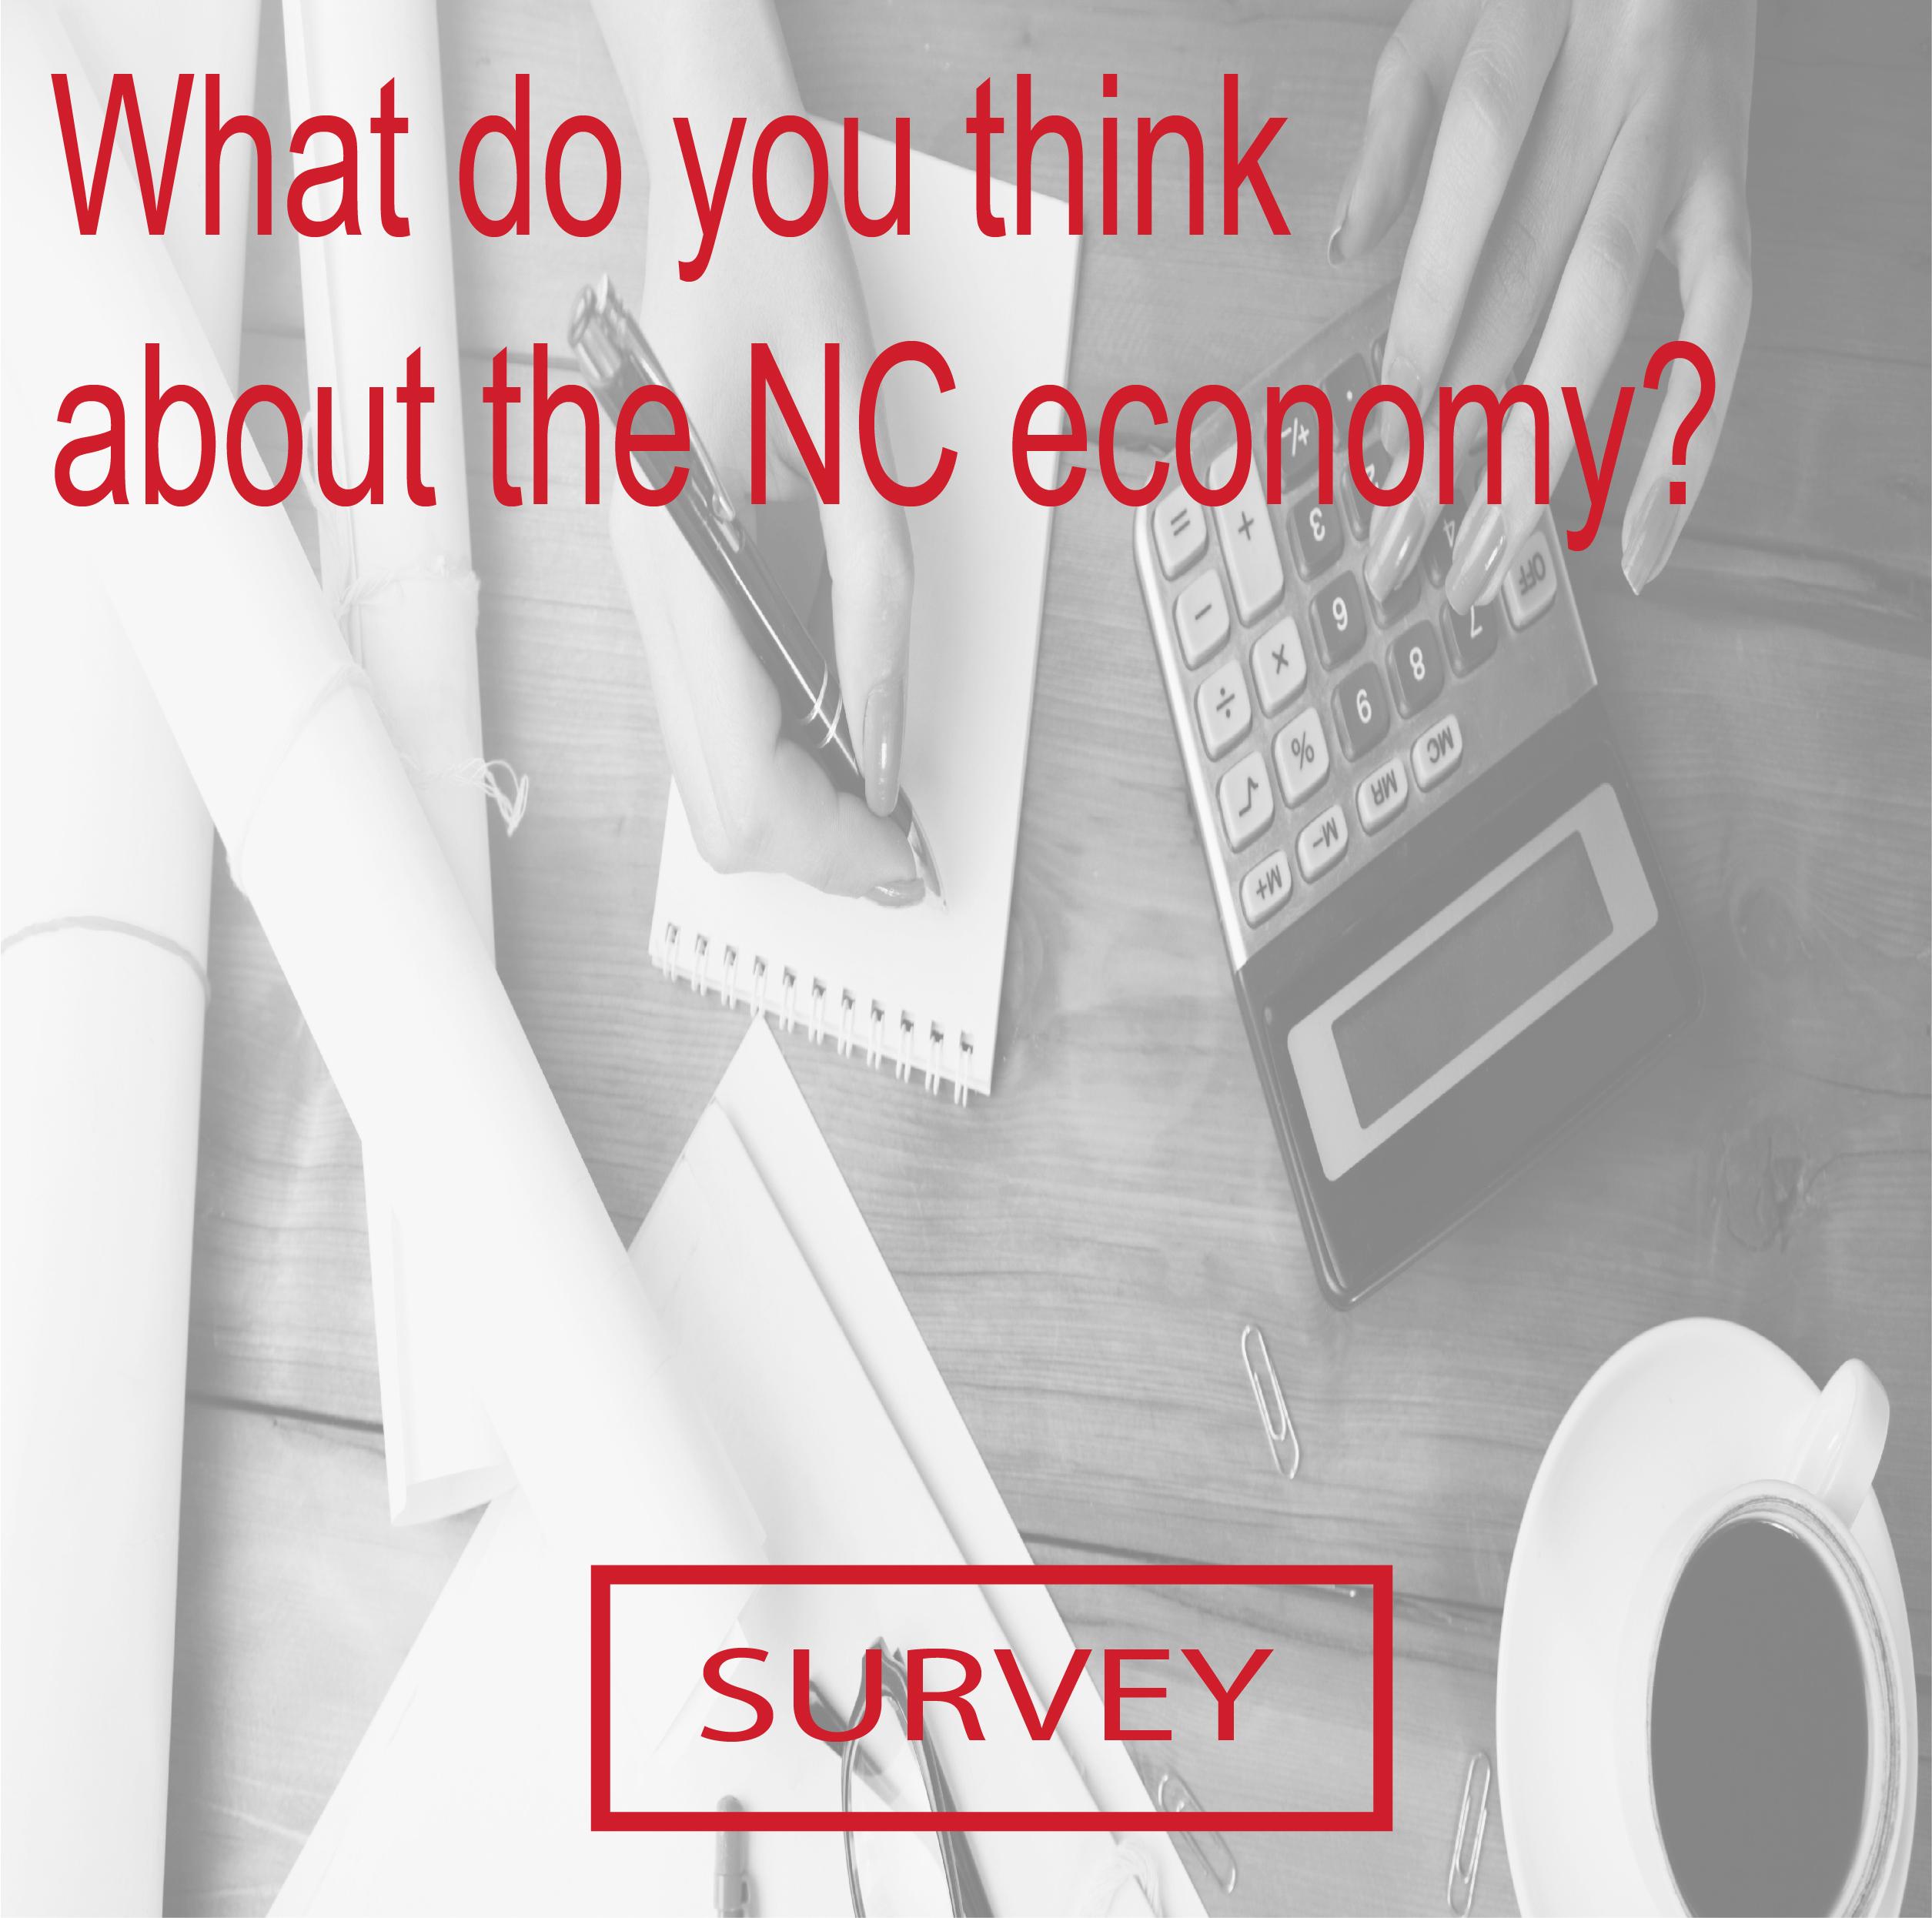 nc_economy_survery.jpg